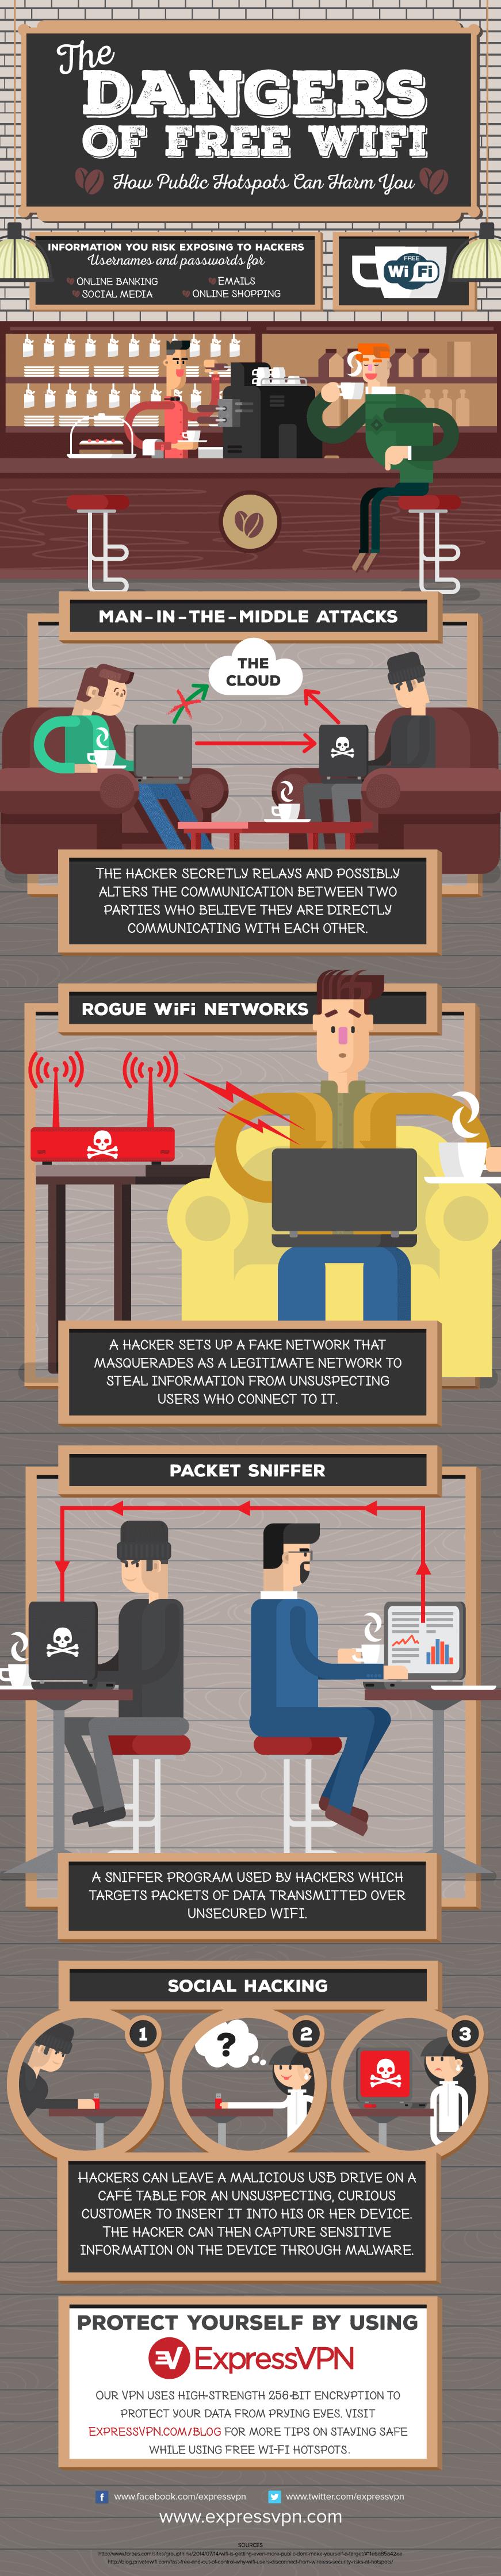 the-dangers-of-free-wifi